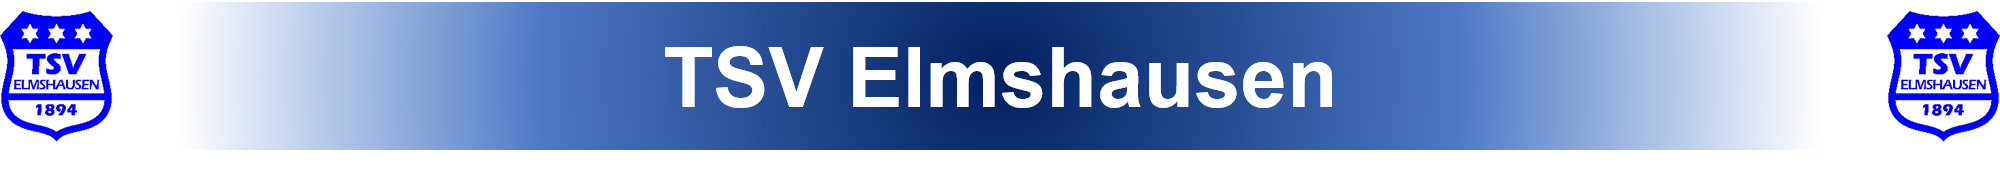 TSV Elmshausen